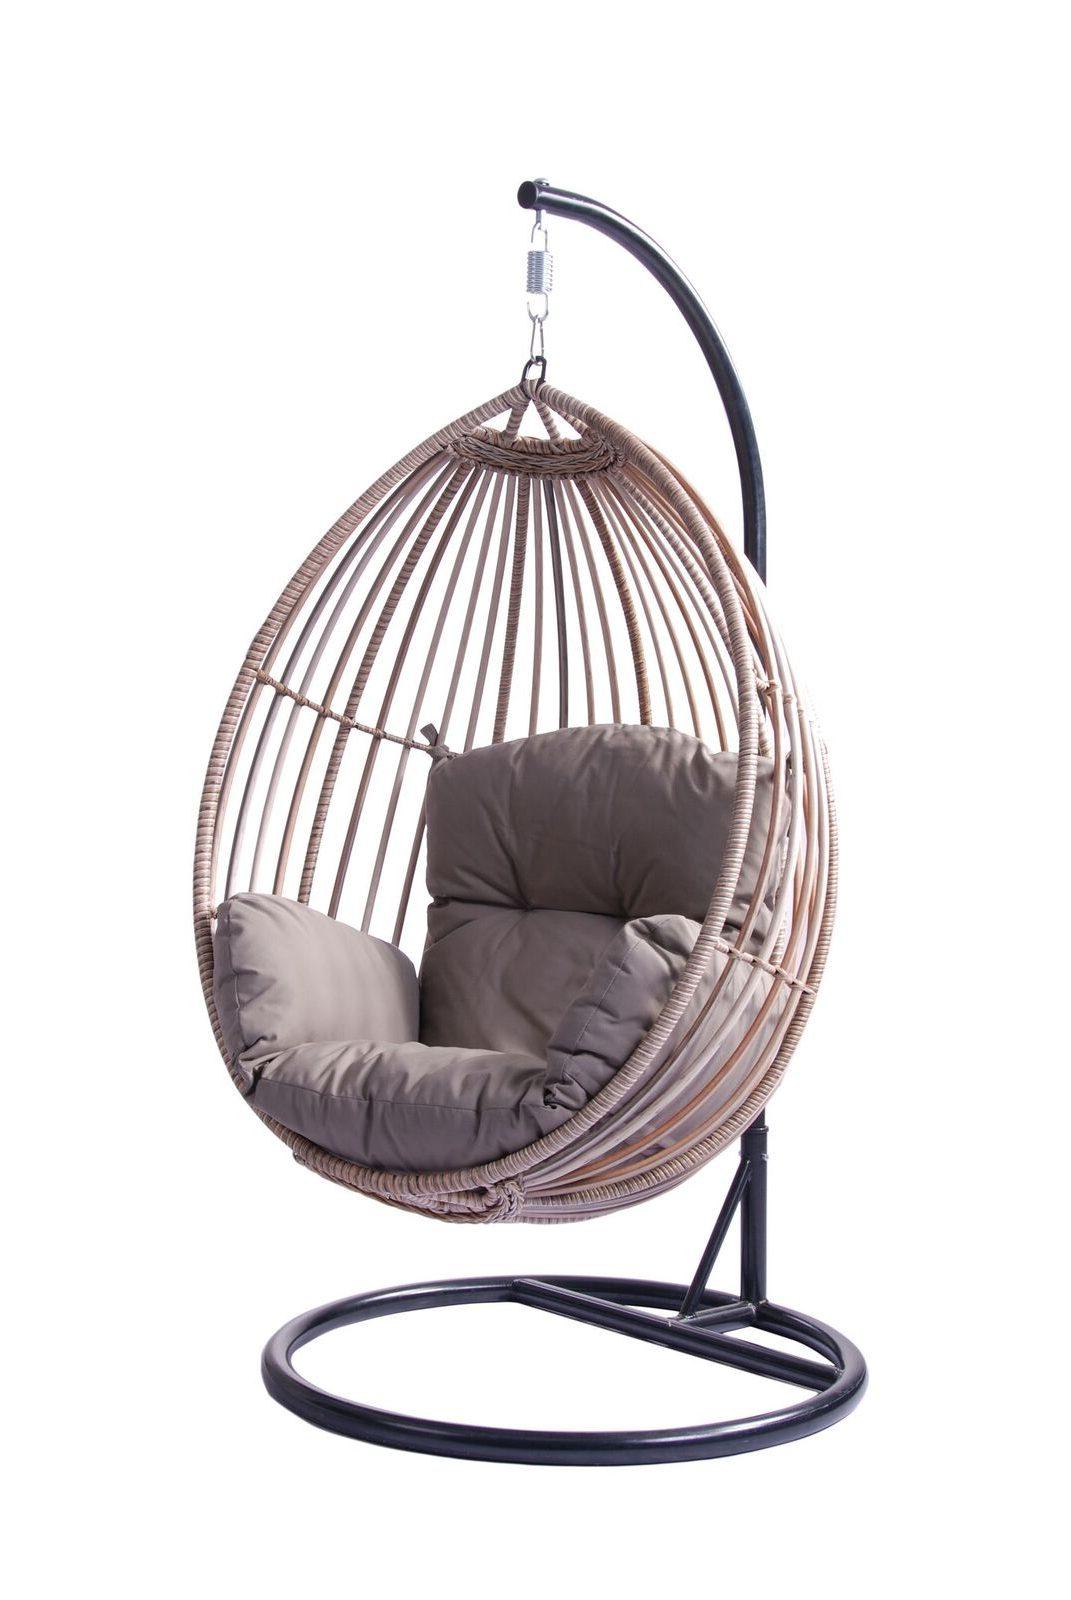 Koala Hanging Egg Chair - Natural Look - Cobra Cane